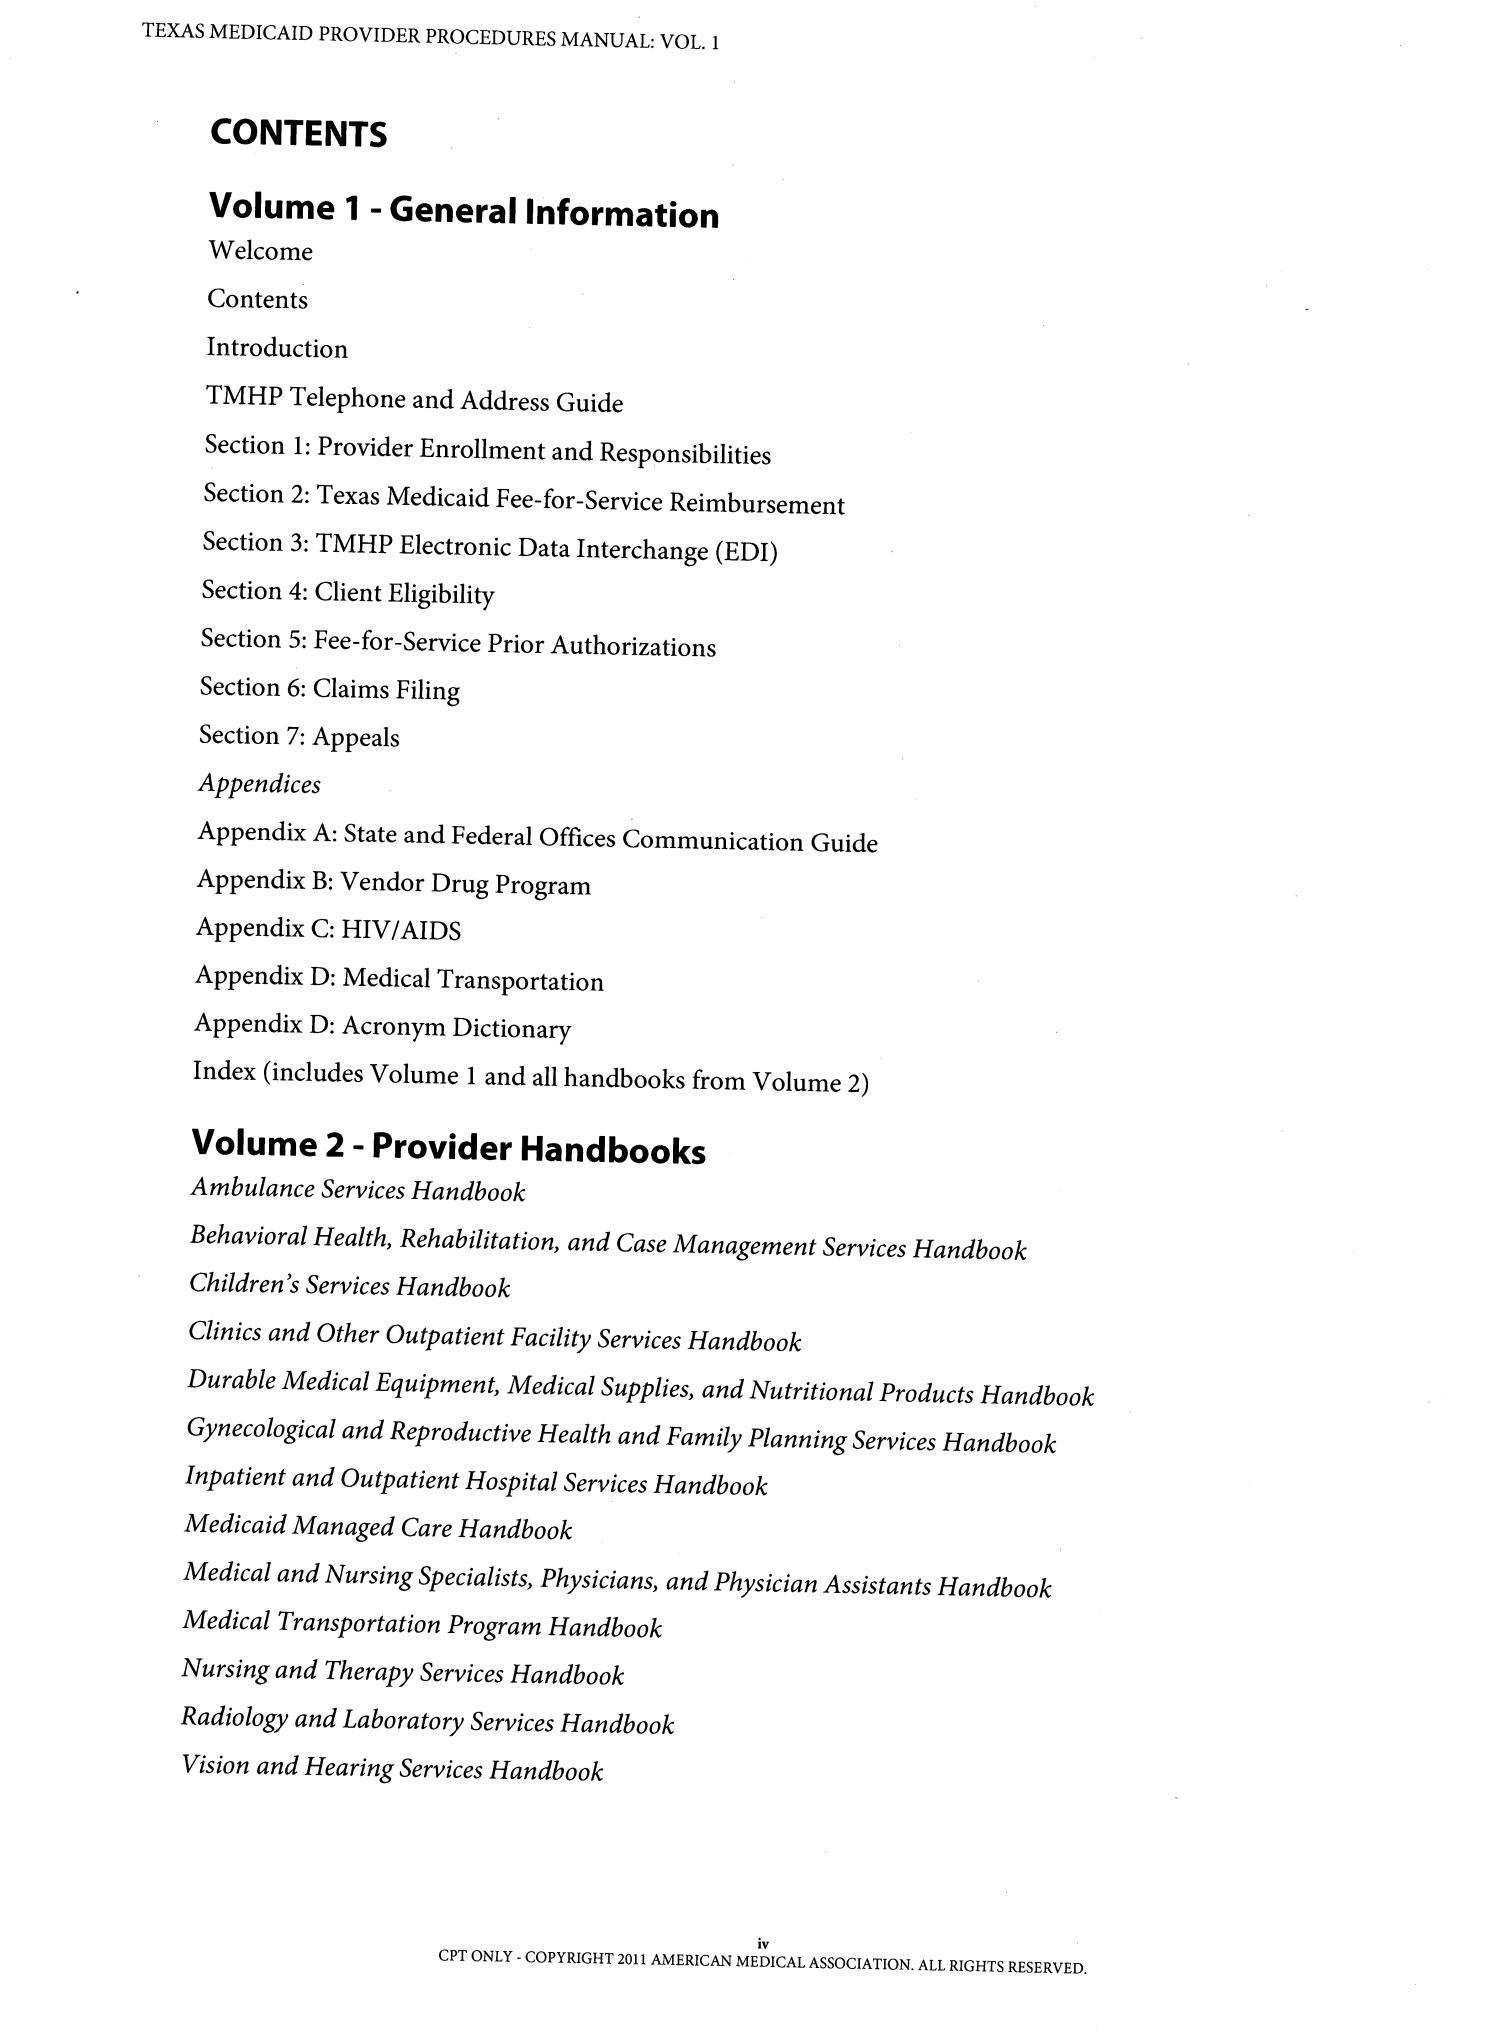 Texas Medicaid Provider Procedures Manual Volume 1 Manual Guide